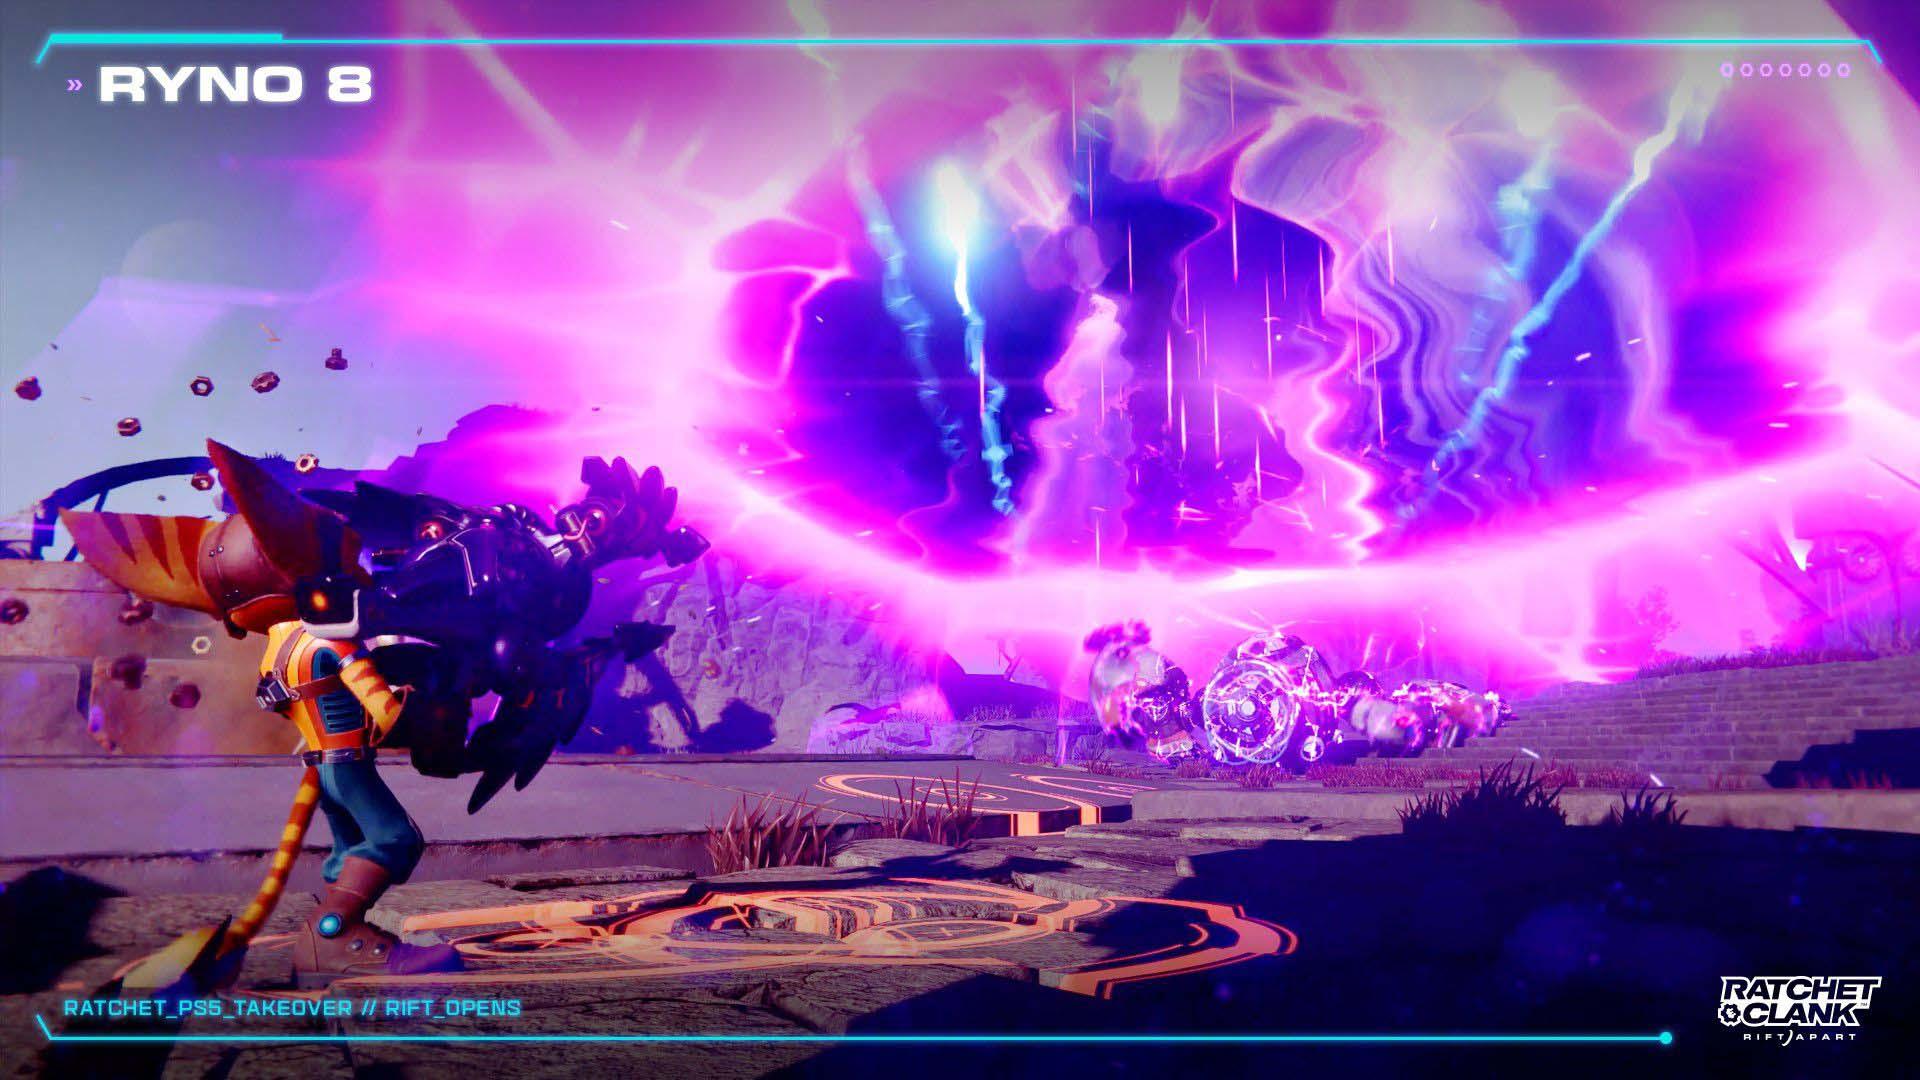 Ratchet & Clank: Rift Apart RYNO 8